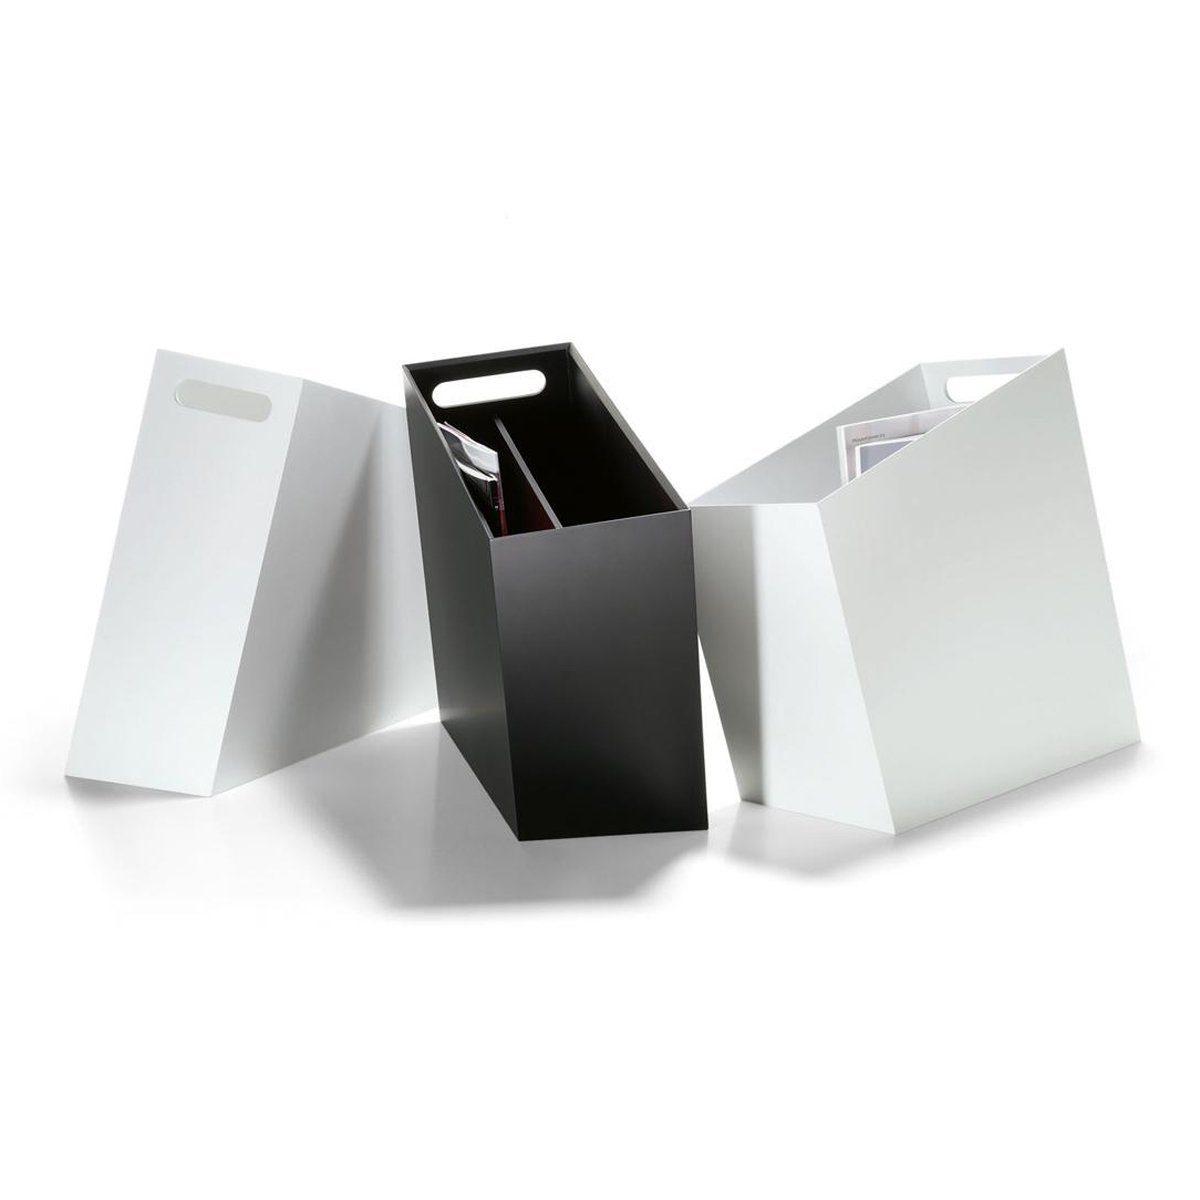 Philippi Philippi Magazinständer BOX schwarz